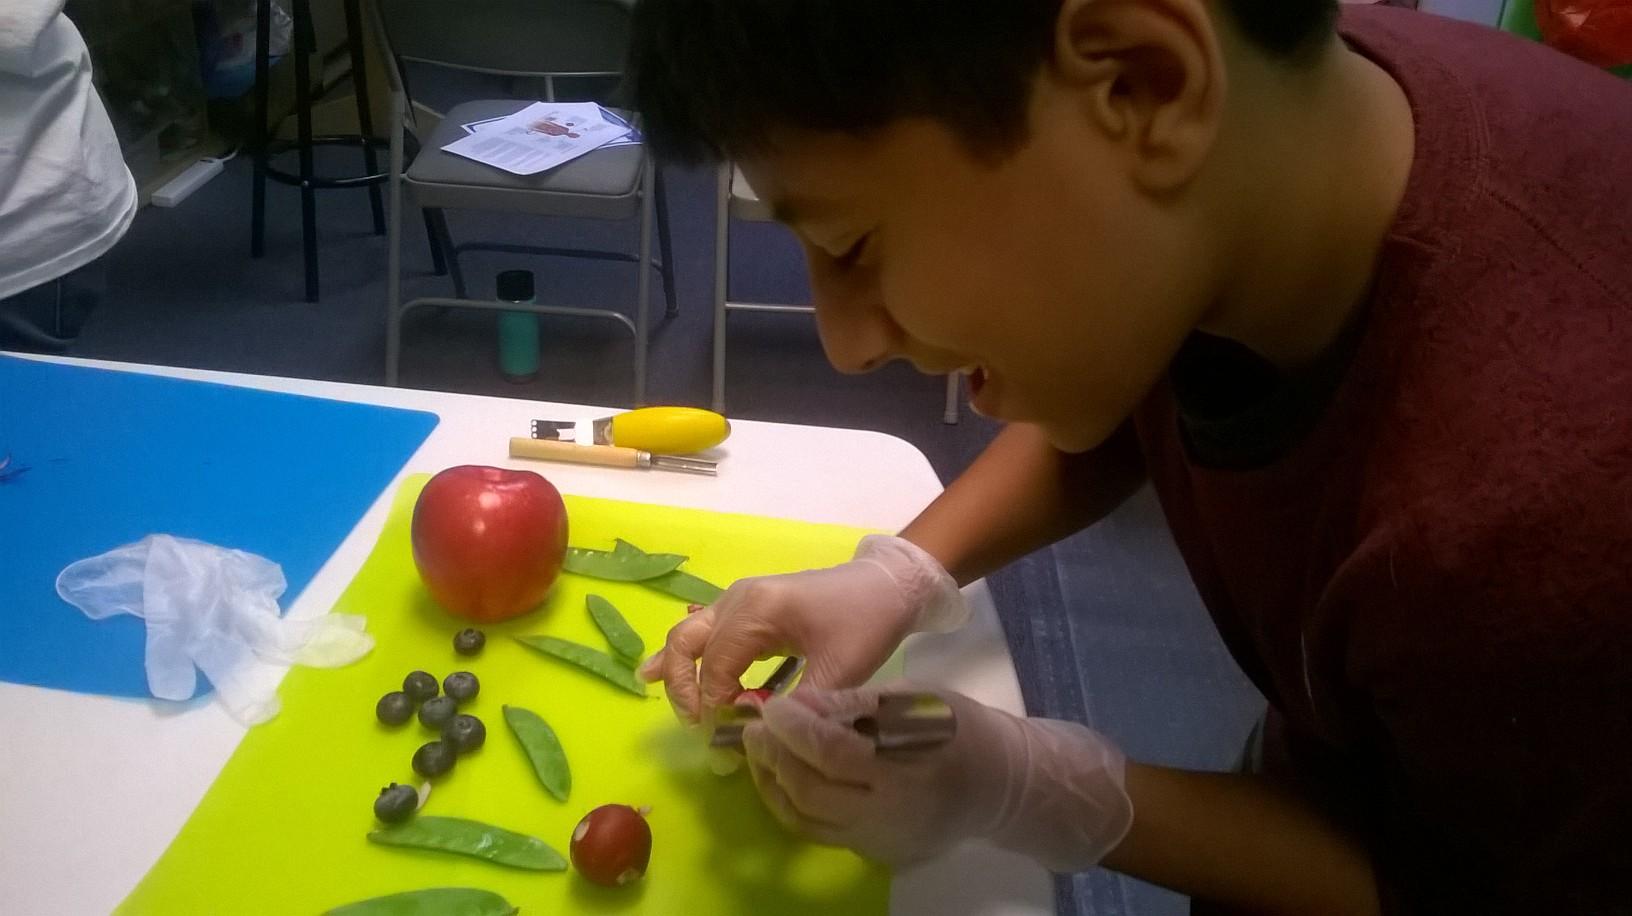 Making food sculptures